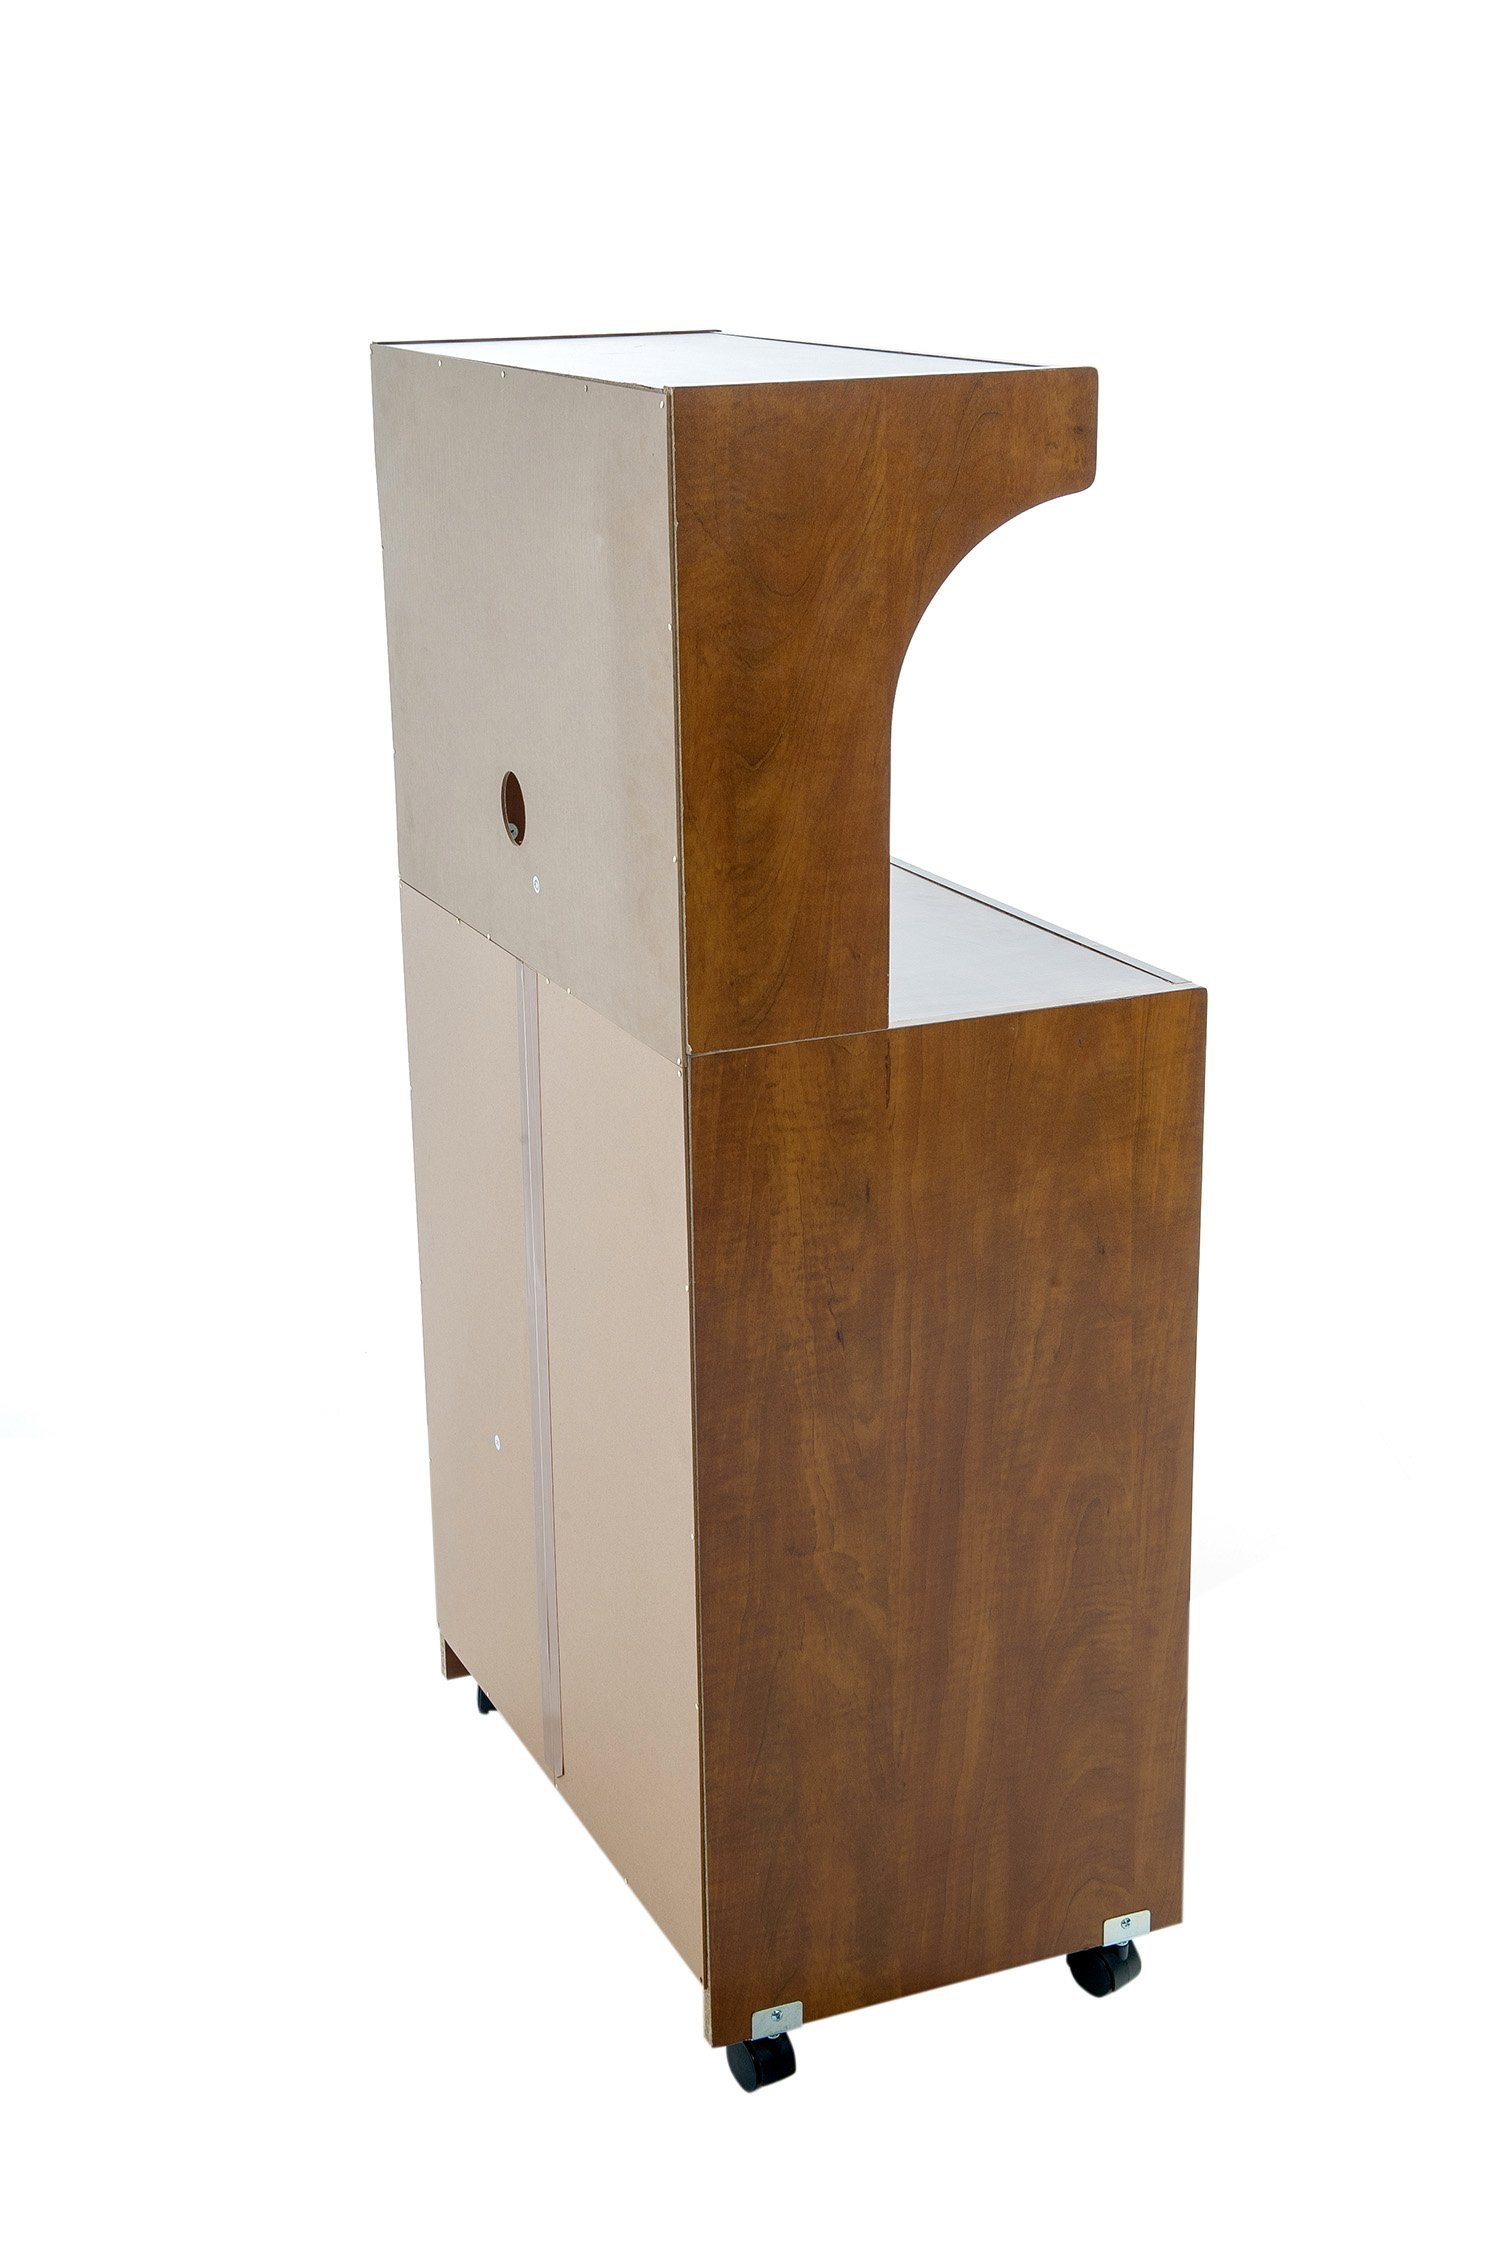 Home Source Industries Kevin Oak Microwave Cart, Light Walnut